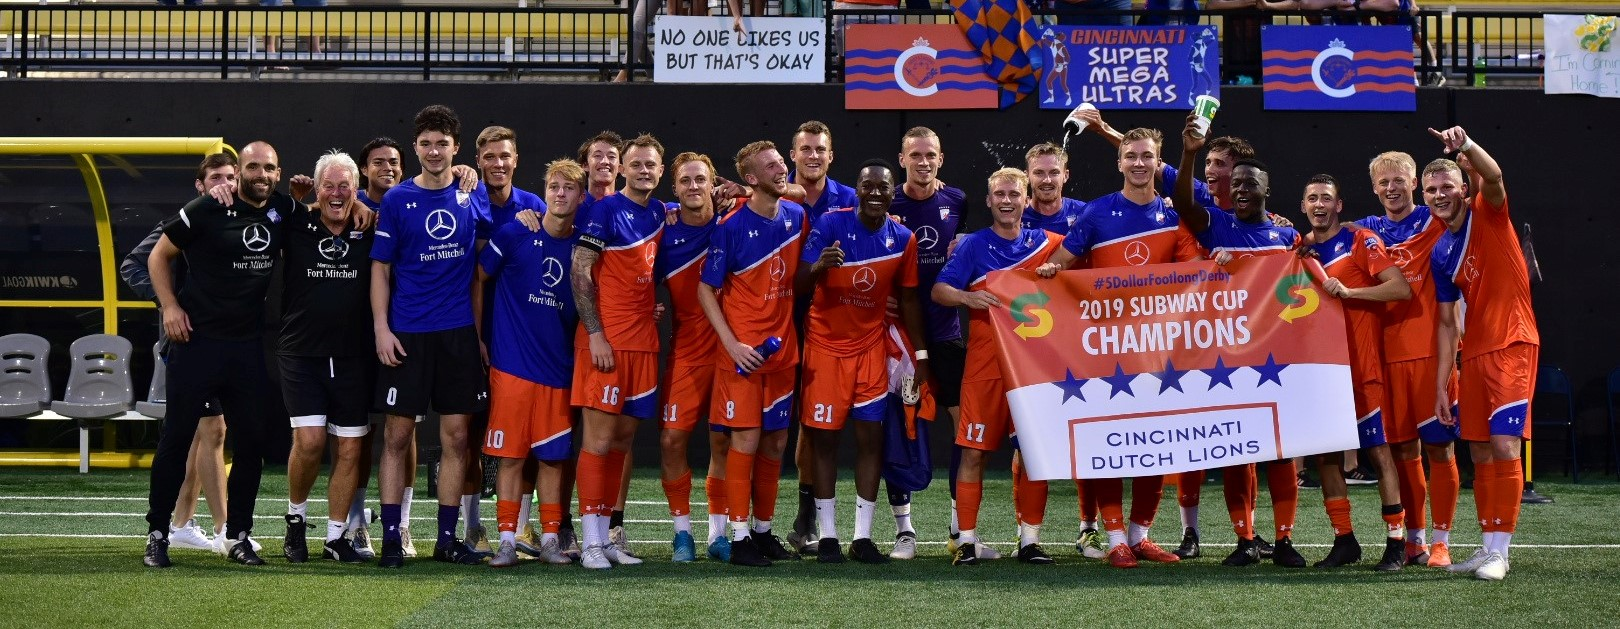 Cincinnati Dutch Lions FC